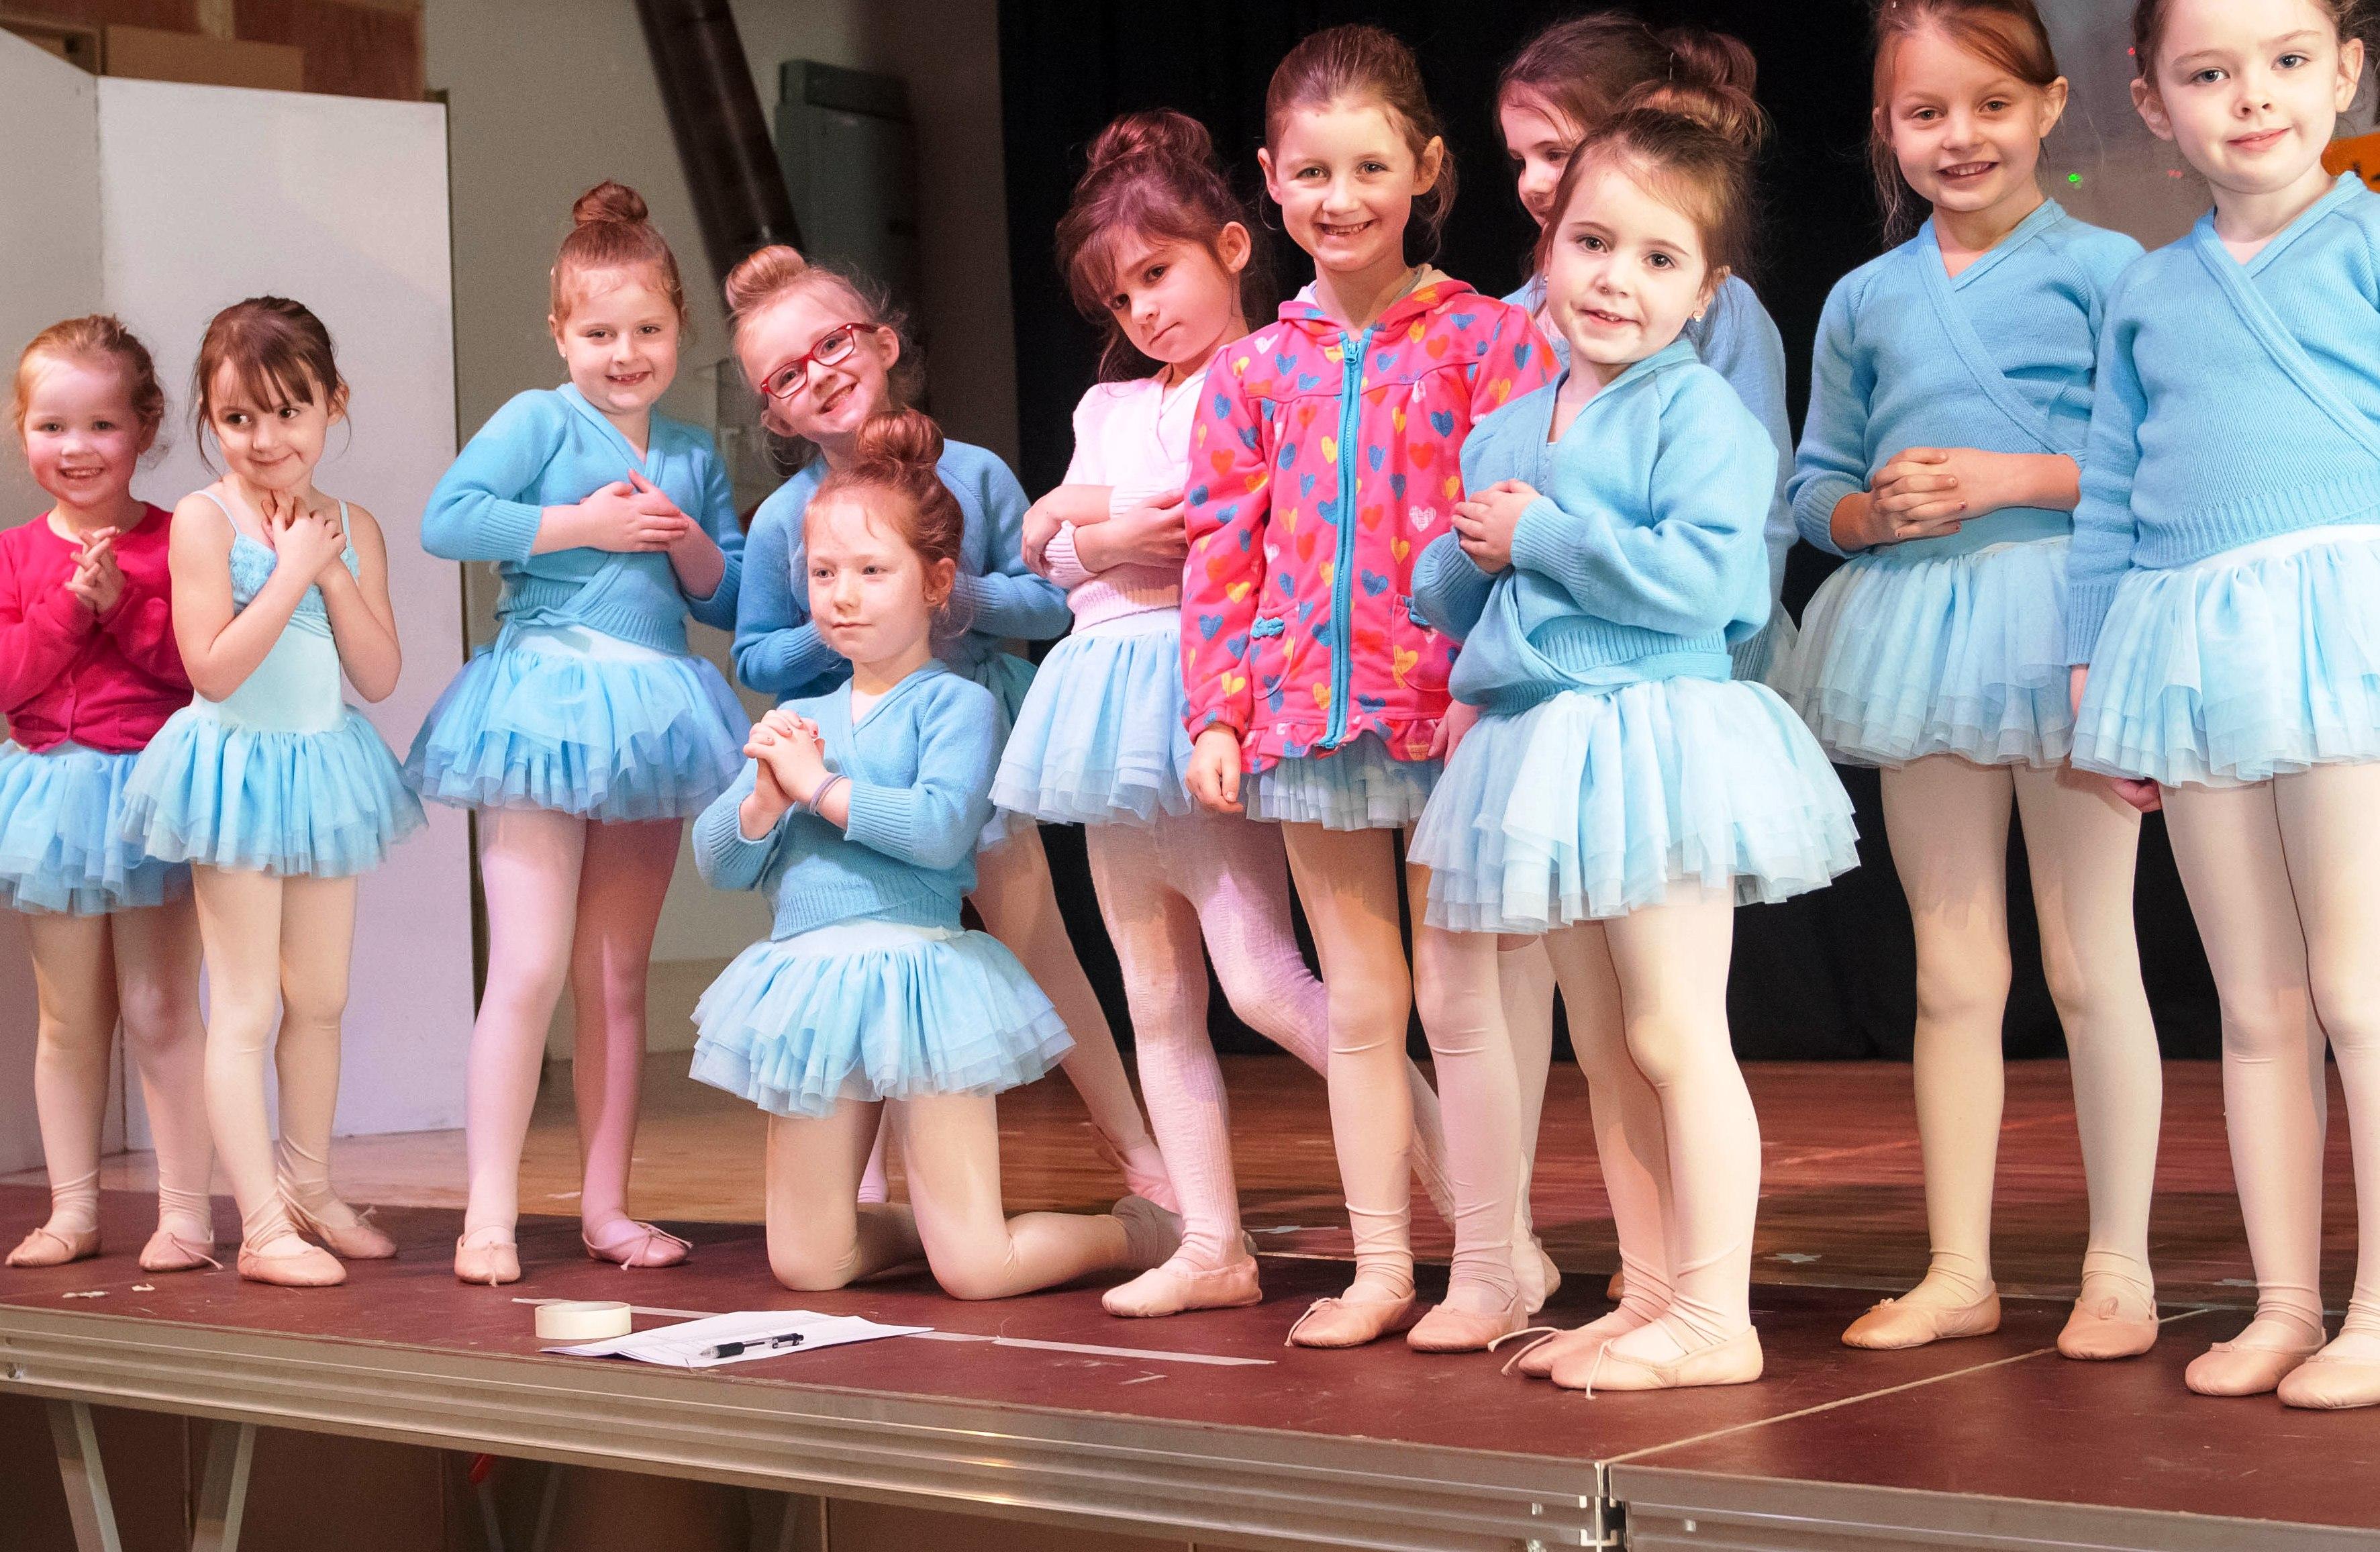 8205: Quigley's Point ballet - Aoibhin Kelly, Eleanor Millar, Honey Mcilmoyle, Shelly Diamond, Shannon Kearney, Aisling Harvey, Nicole O'Hara, Aoibhlin Shortt, Eimer McGonagle, Shauna O'Brien, Rhianna McGonagle